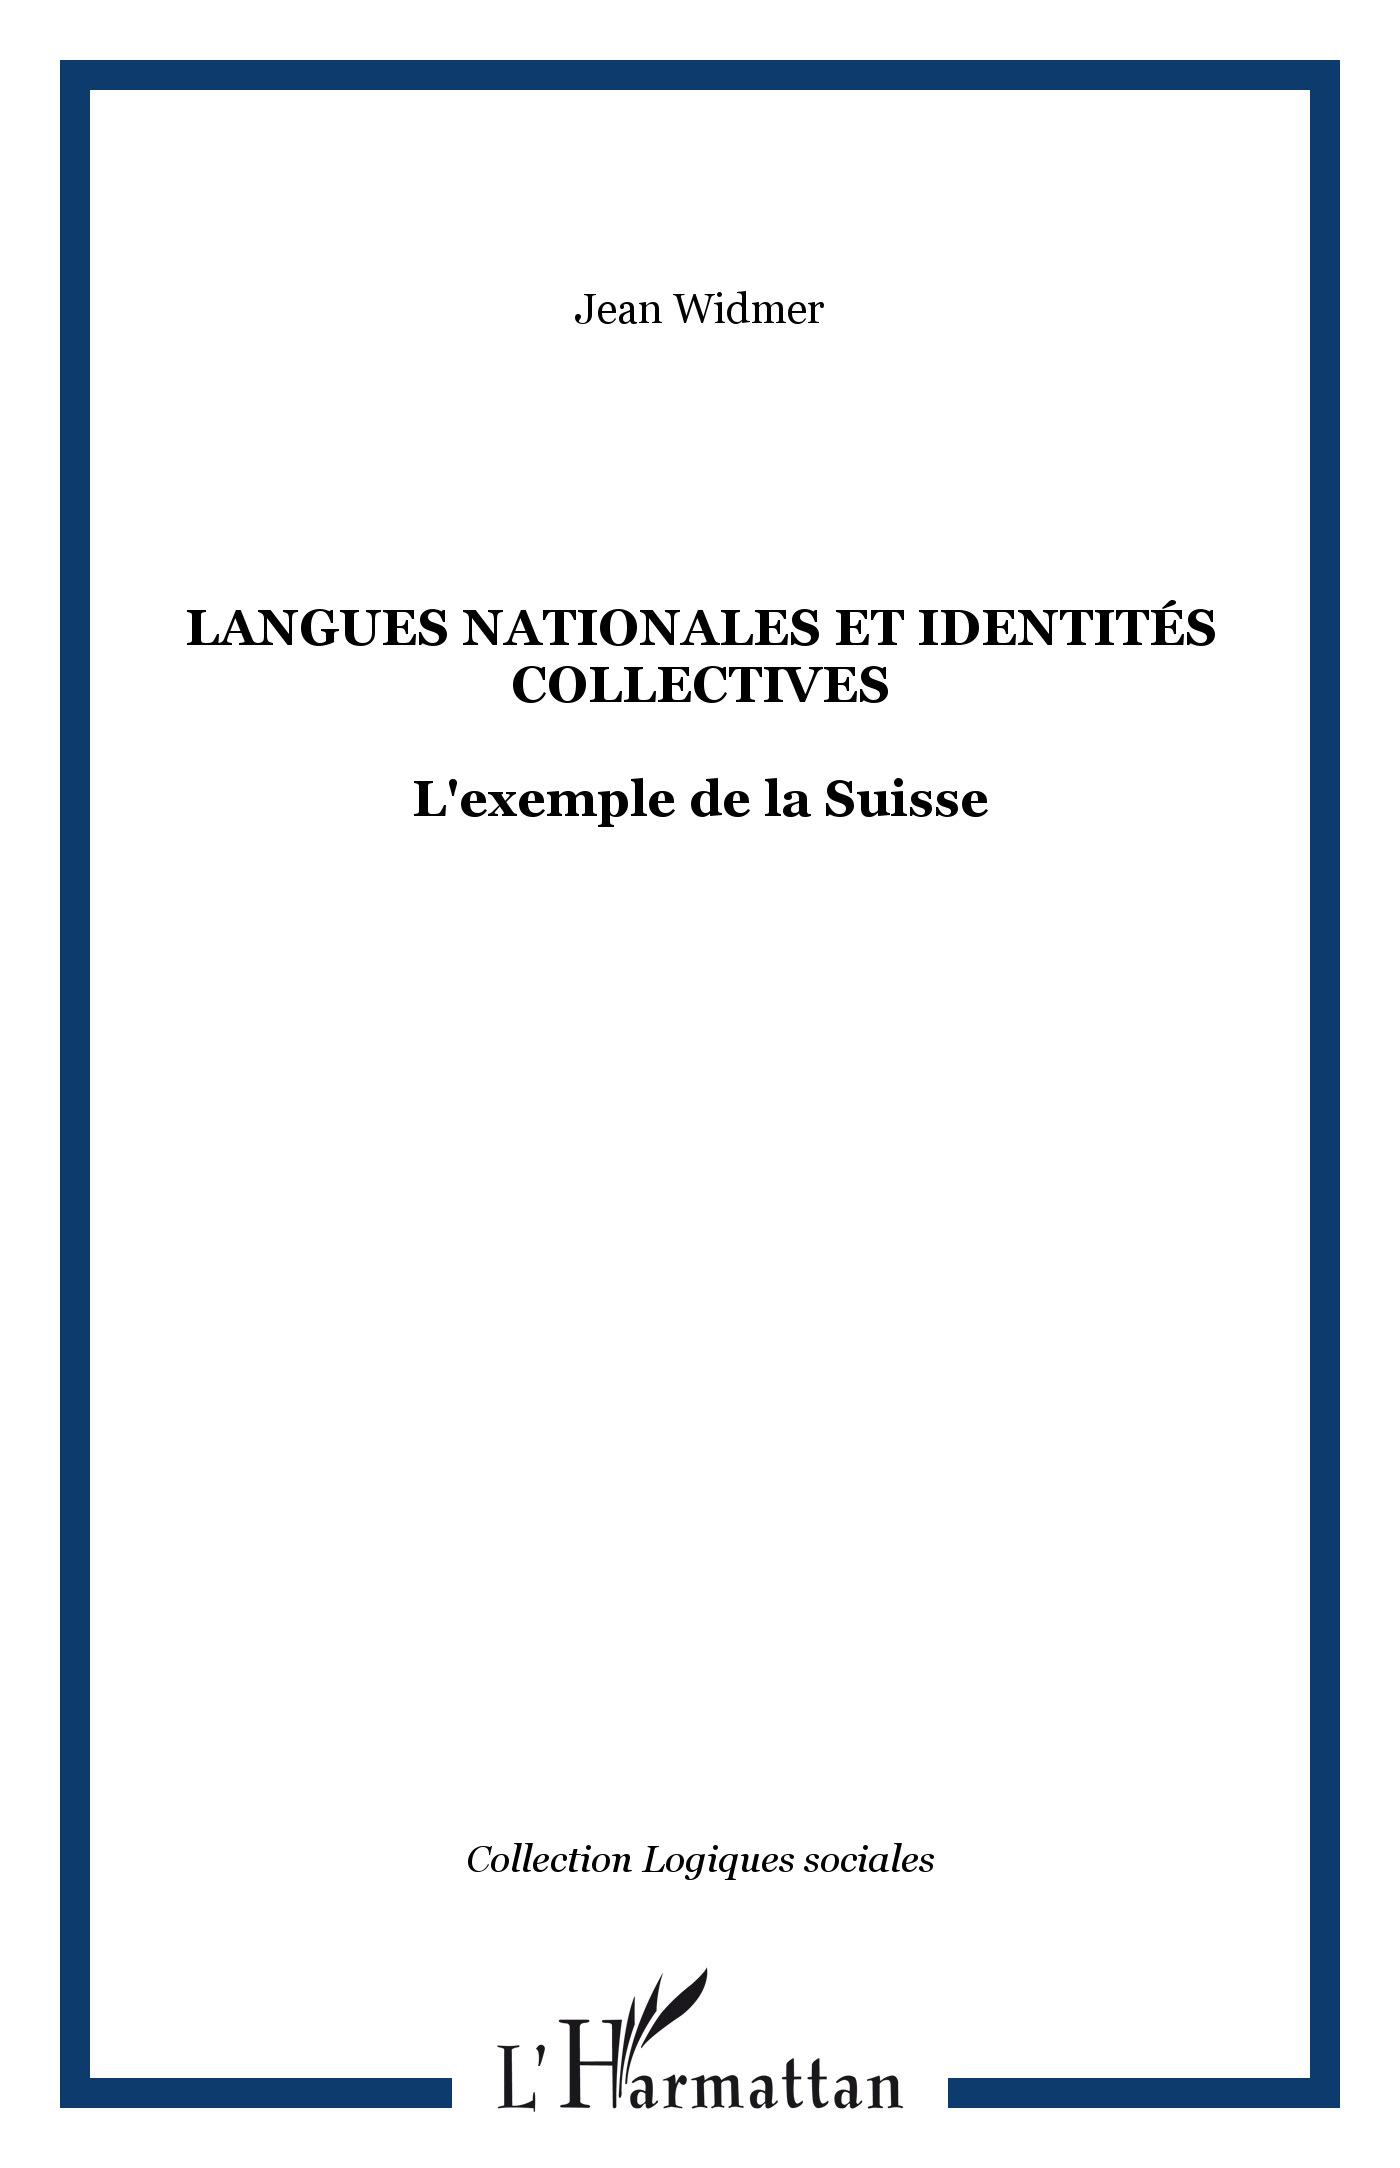 Langues nationales